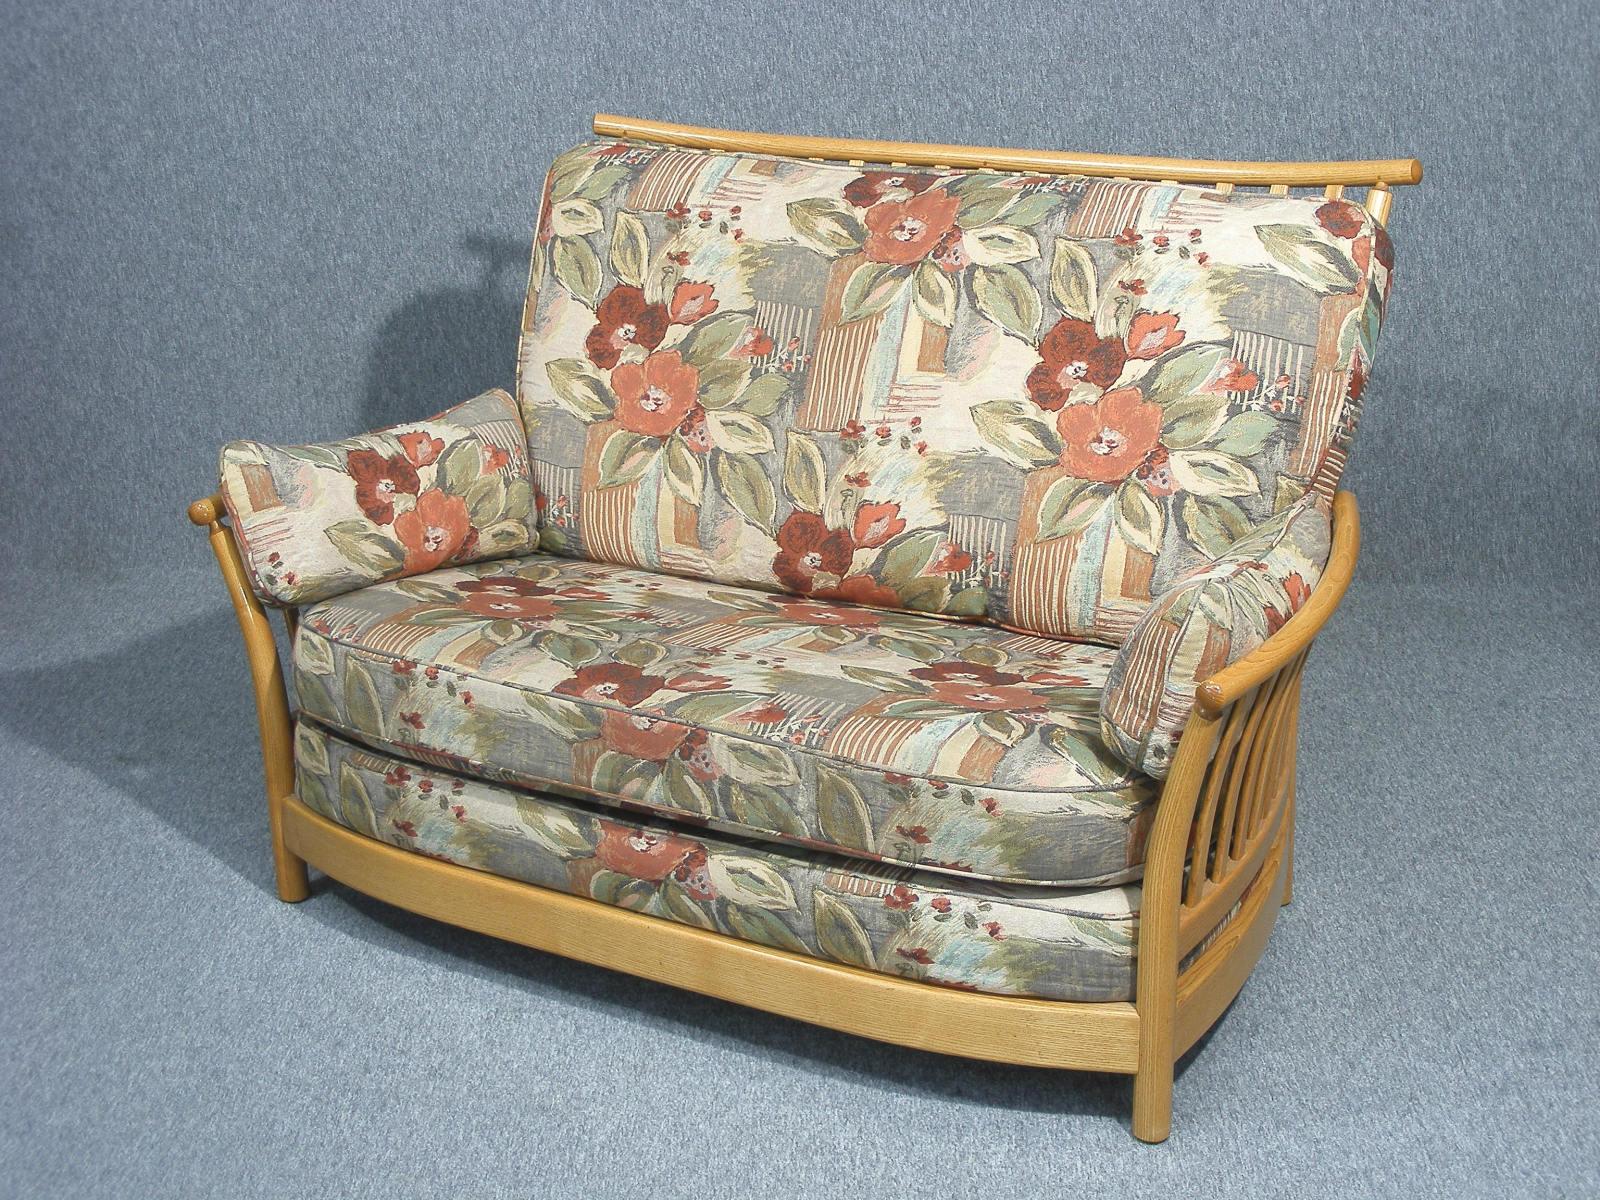 Ercol Sofa Quality  Ercol Renaissance  2 Seater Settee  Sofa